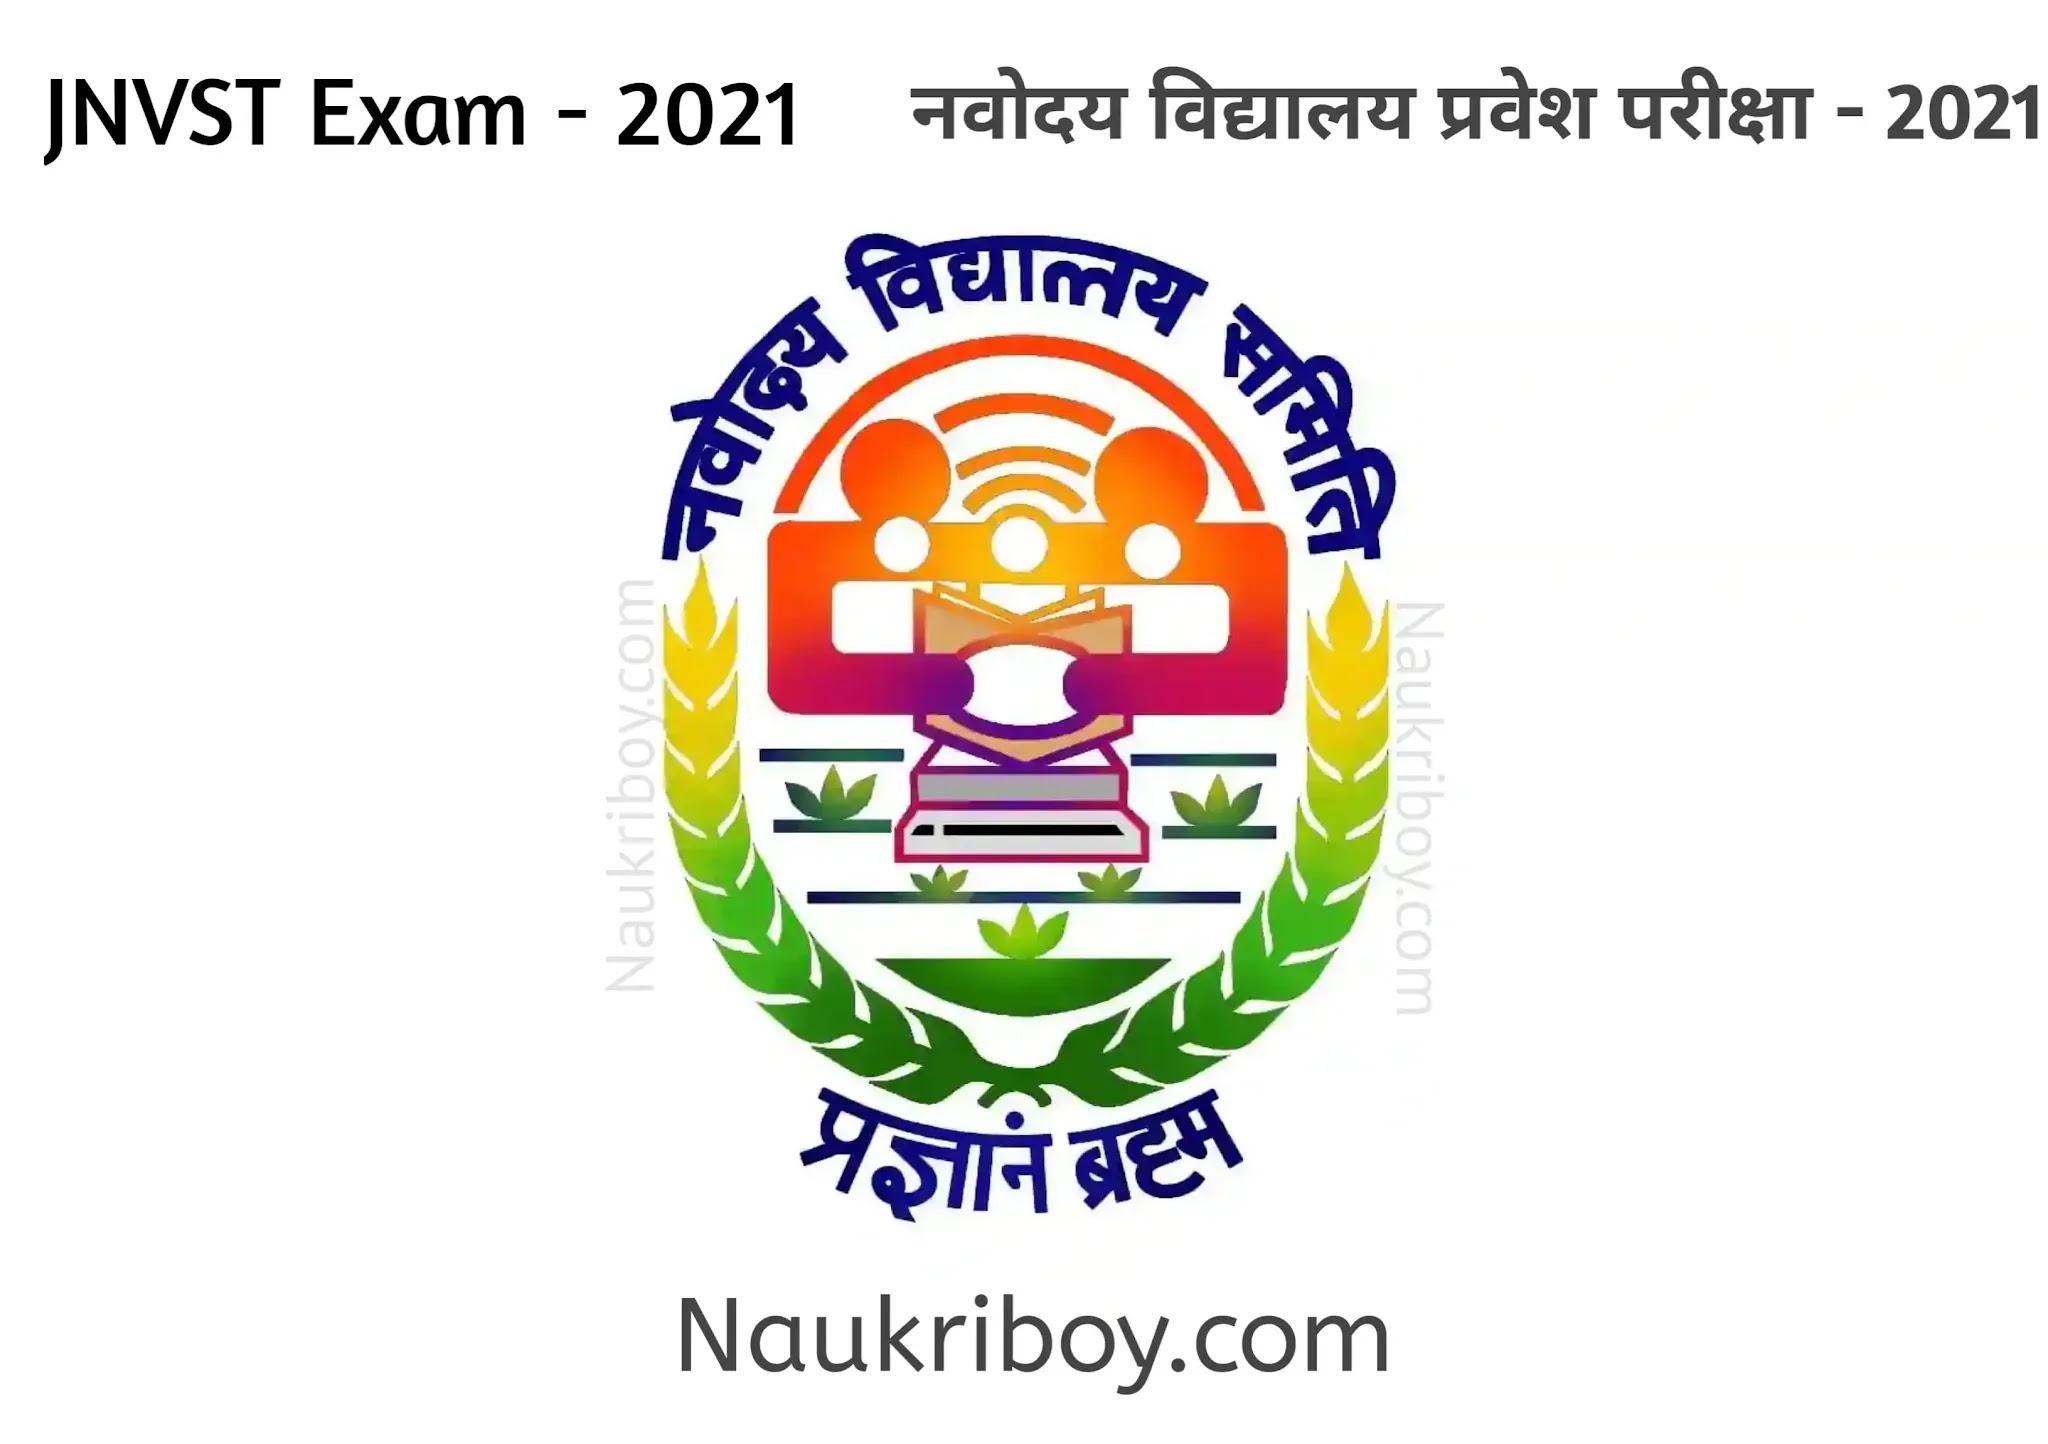 jnvst exam 2021 jnvst 2021 jnvst 2021 admit card jnv addmission test naukriboy naukriboy.com